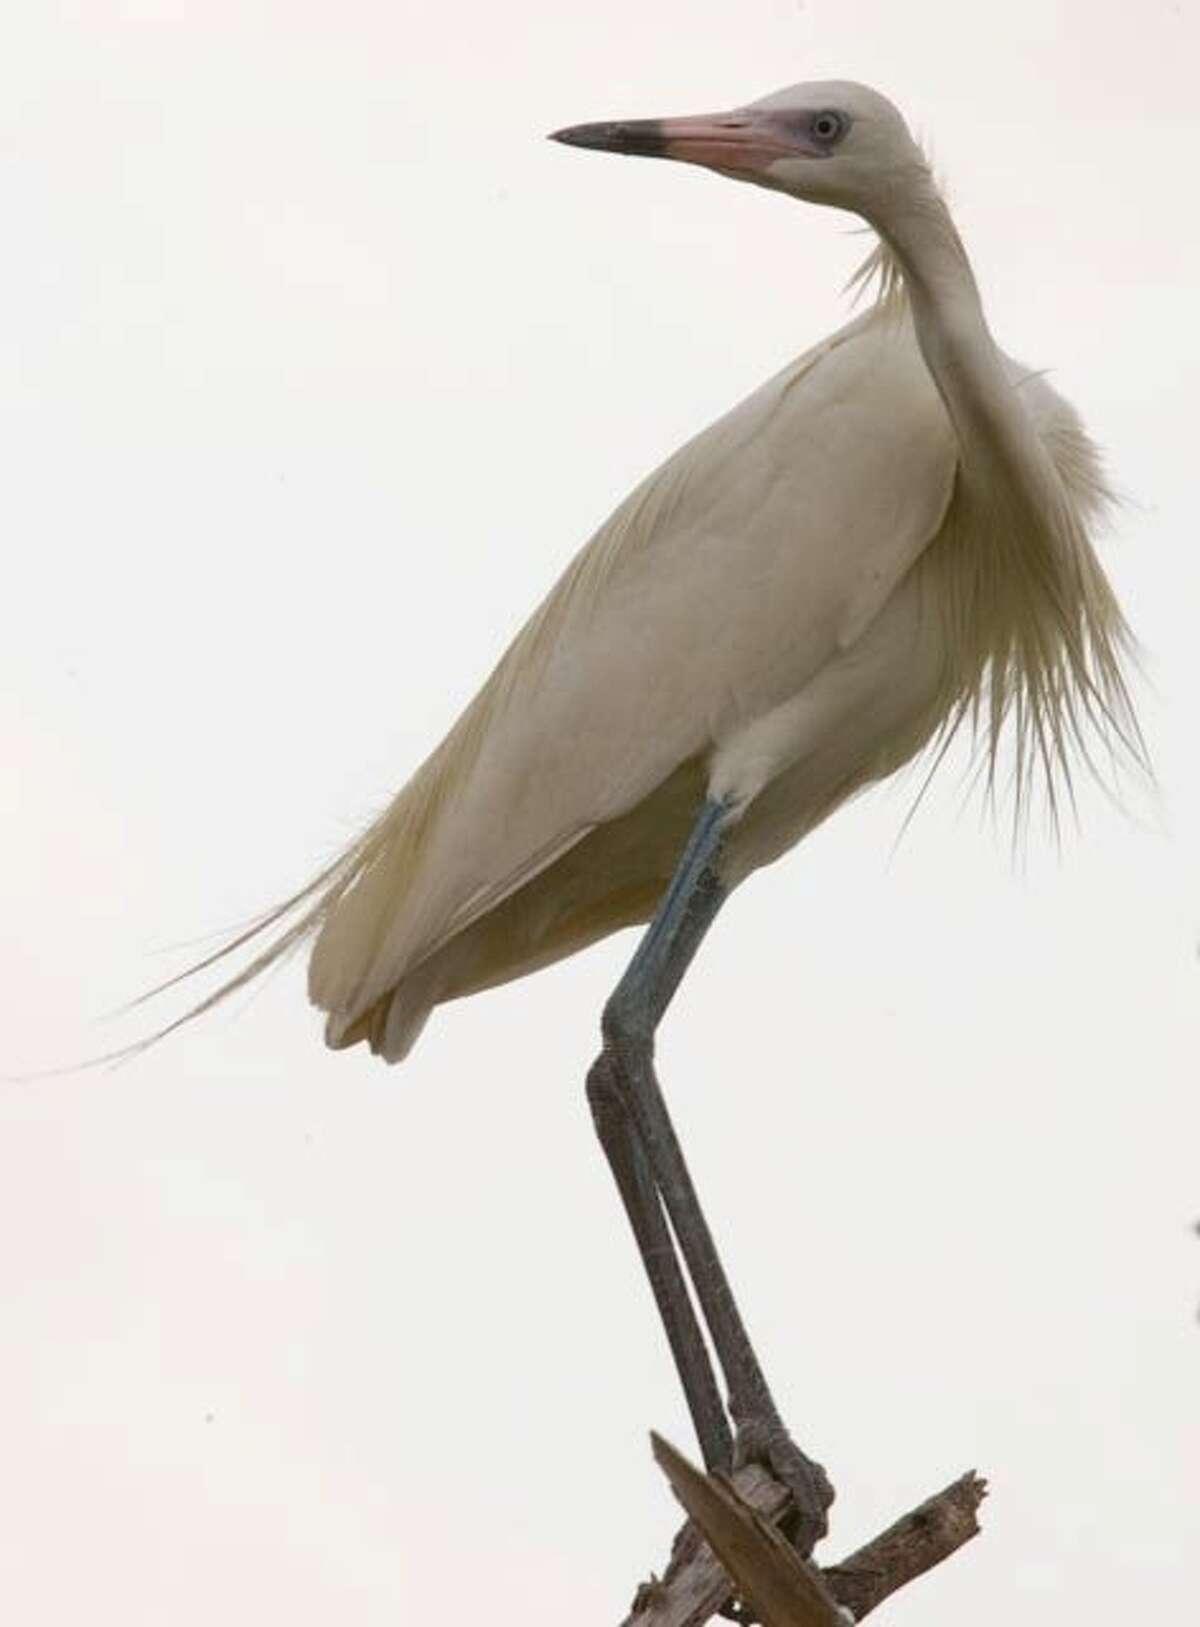 Reddish Egret (white morph) at Green Island in the Lower Laguna Madre.